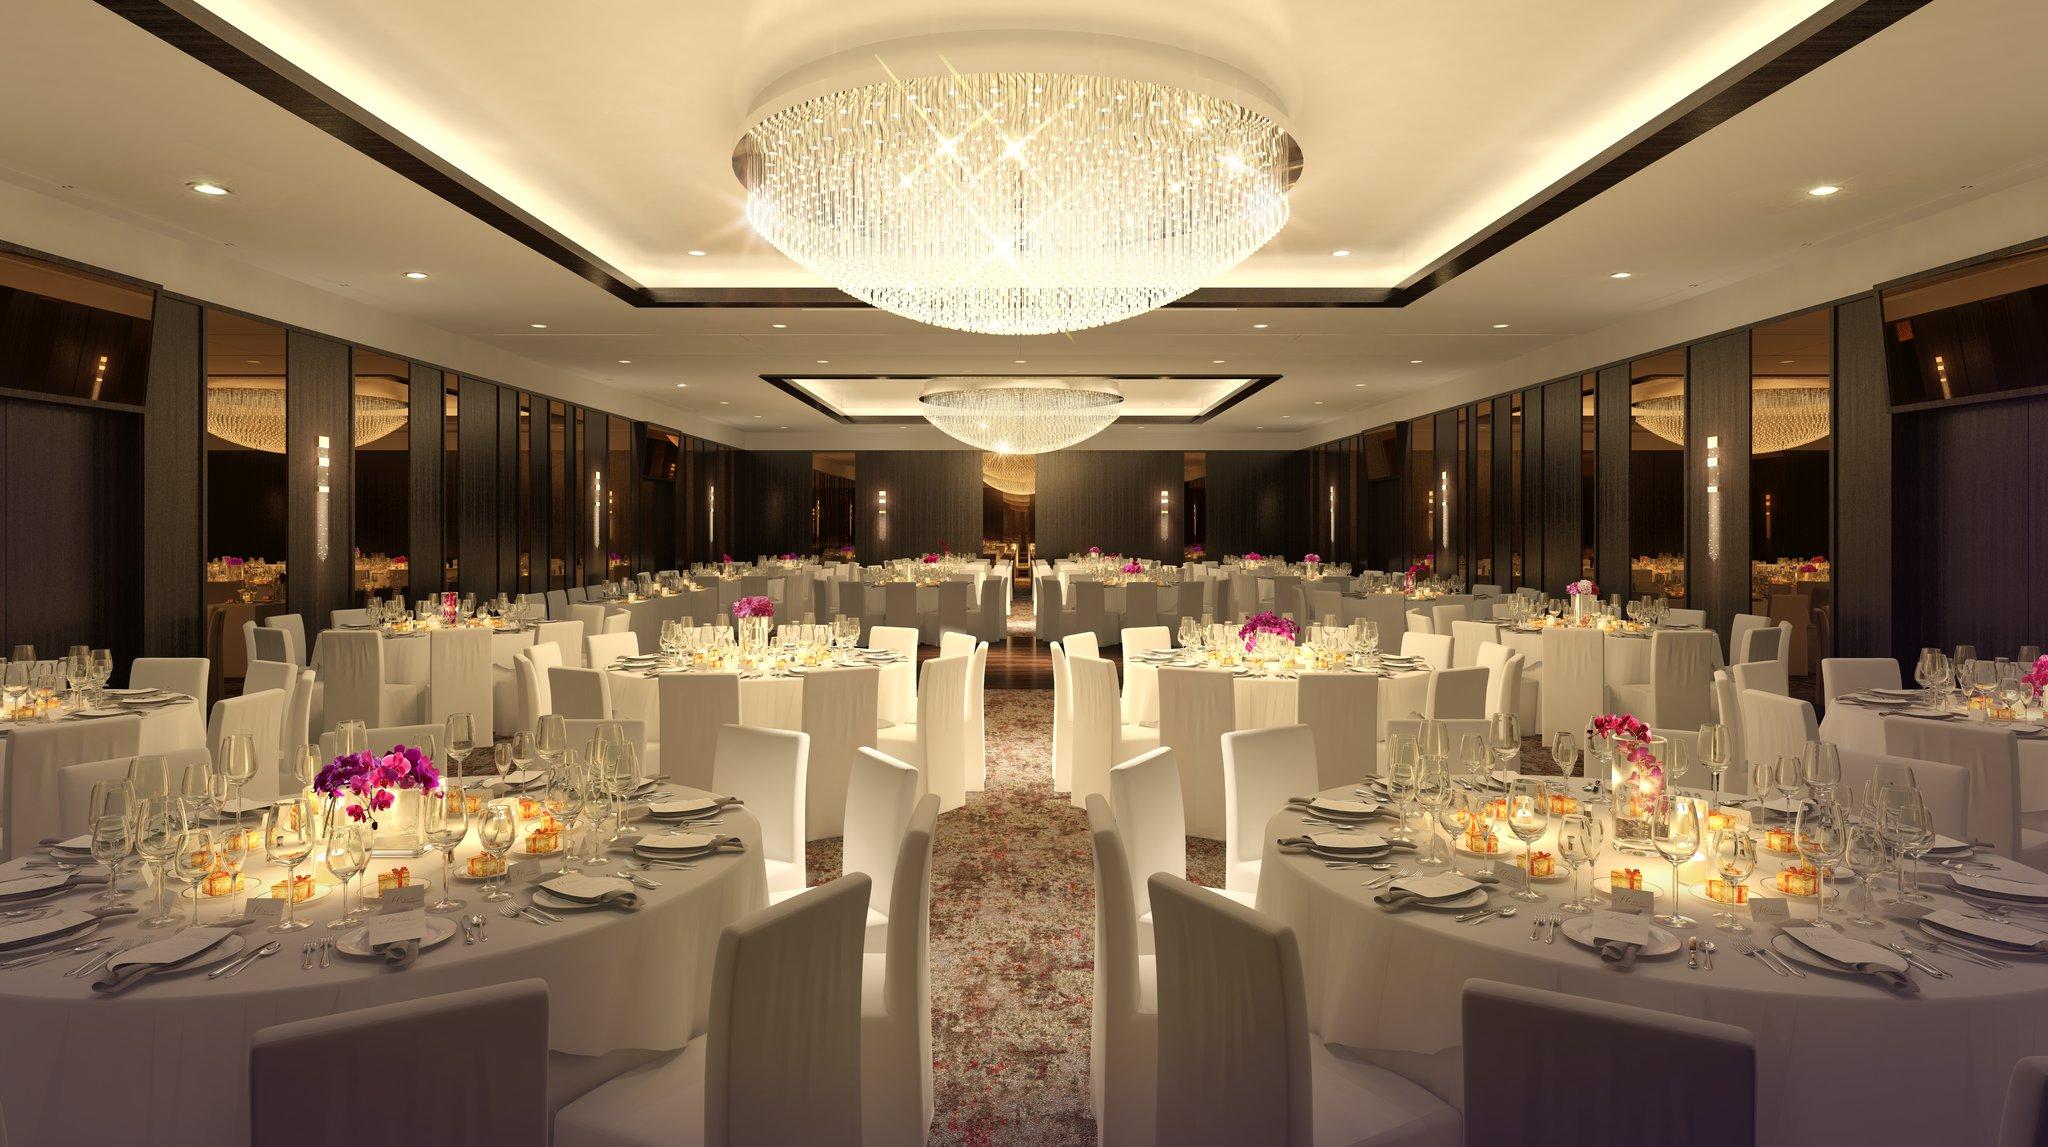 Bypeterandpauls Com Partners With Hotel X Toronto 5 Star Living